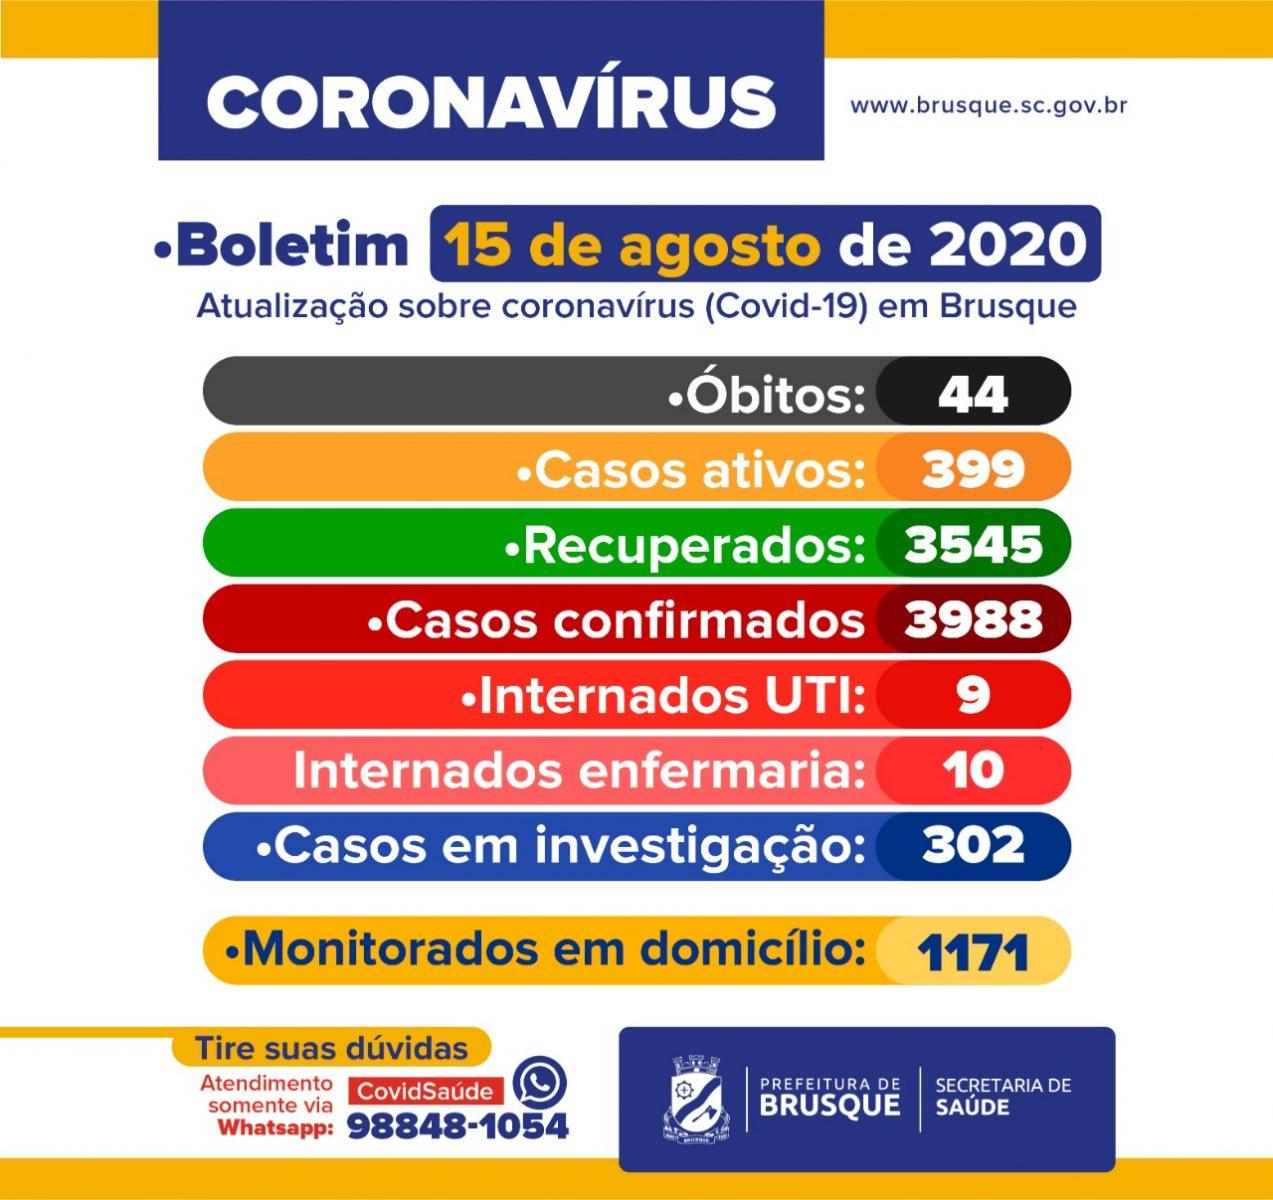 COVID-19: Boletim epidemiológico 15 de agosto